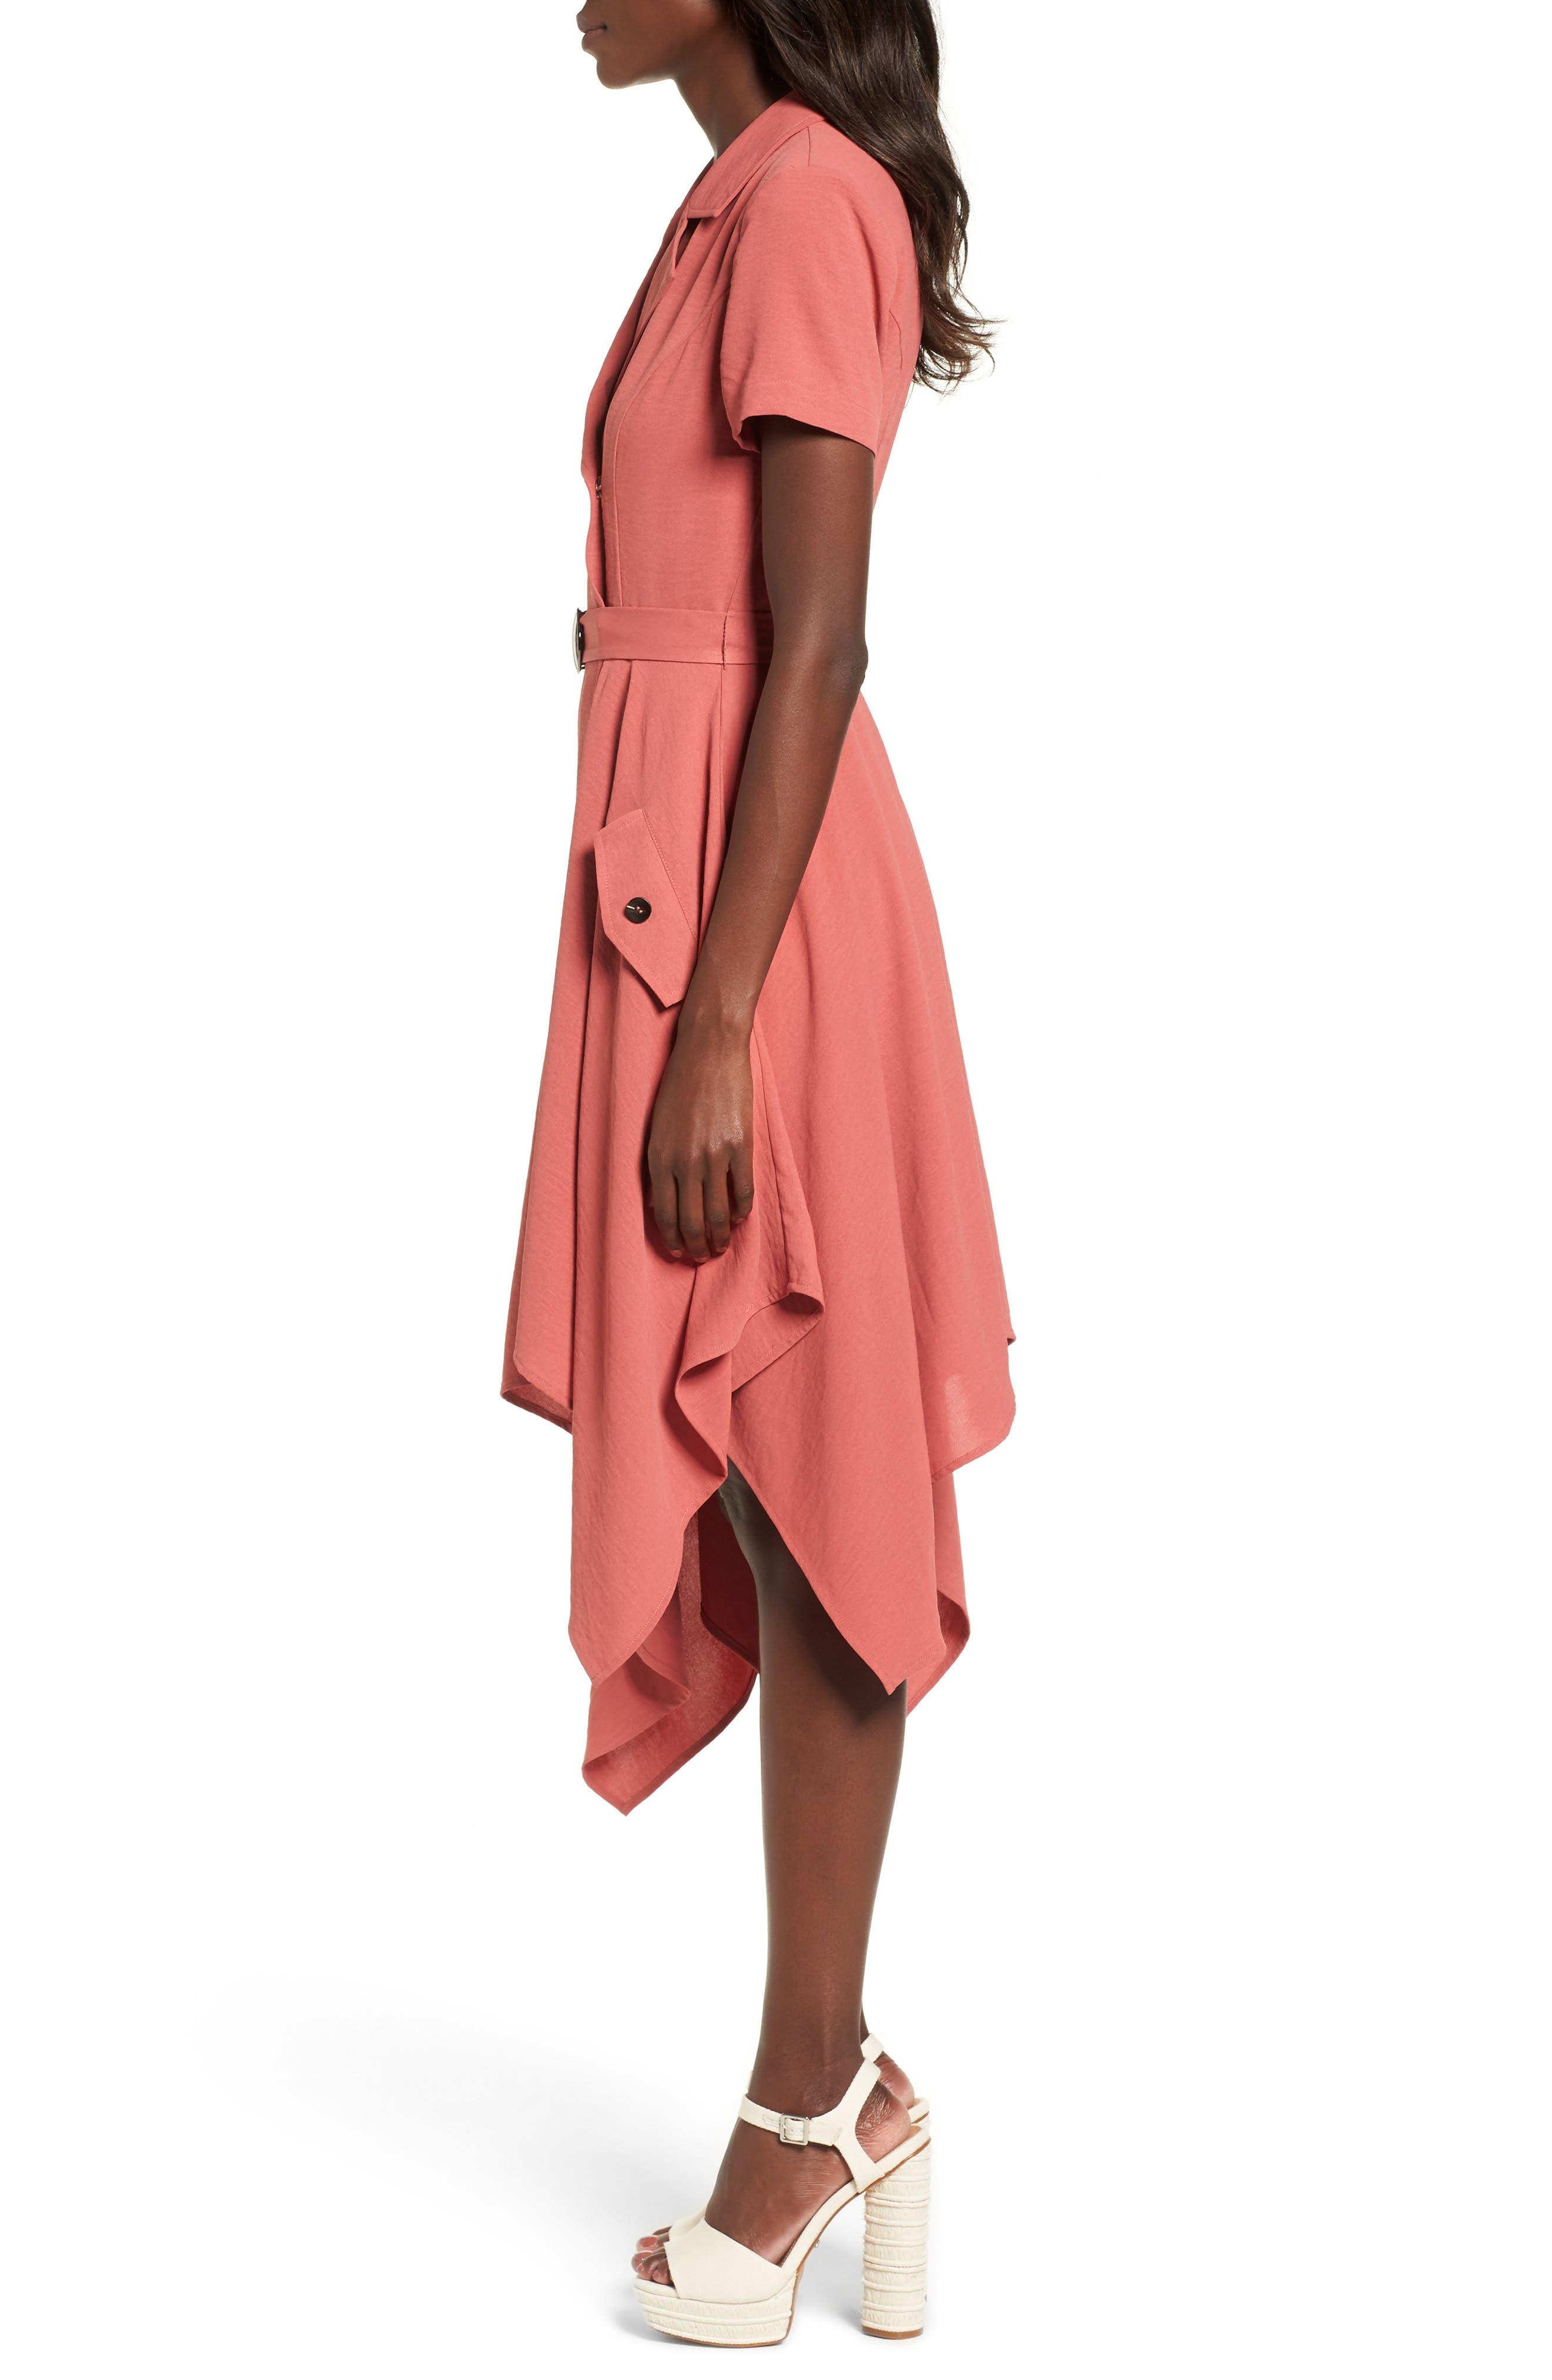 Chriselle x J.O.A. Asymmetrical Trench Dress,                             Alternate thumbnail 5, color,                             Patina